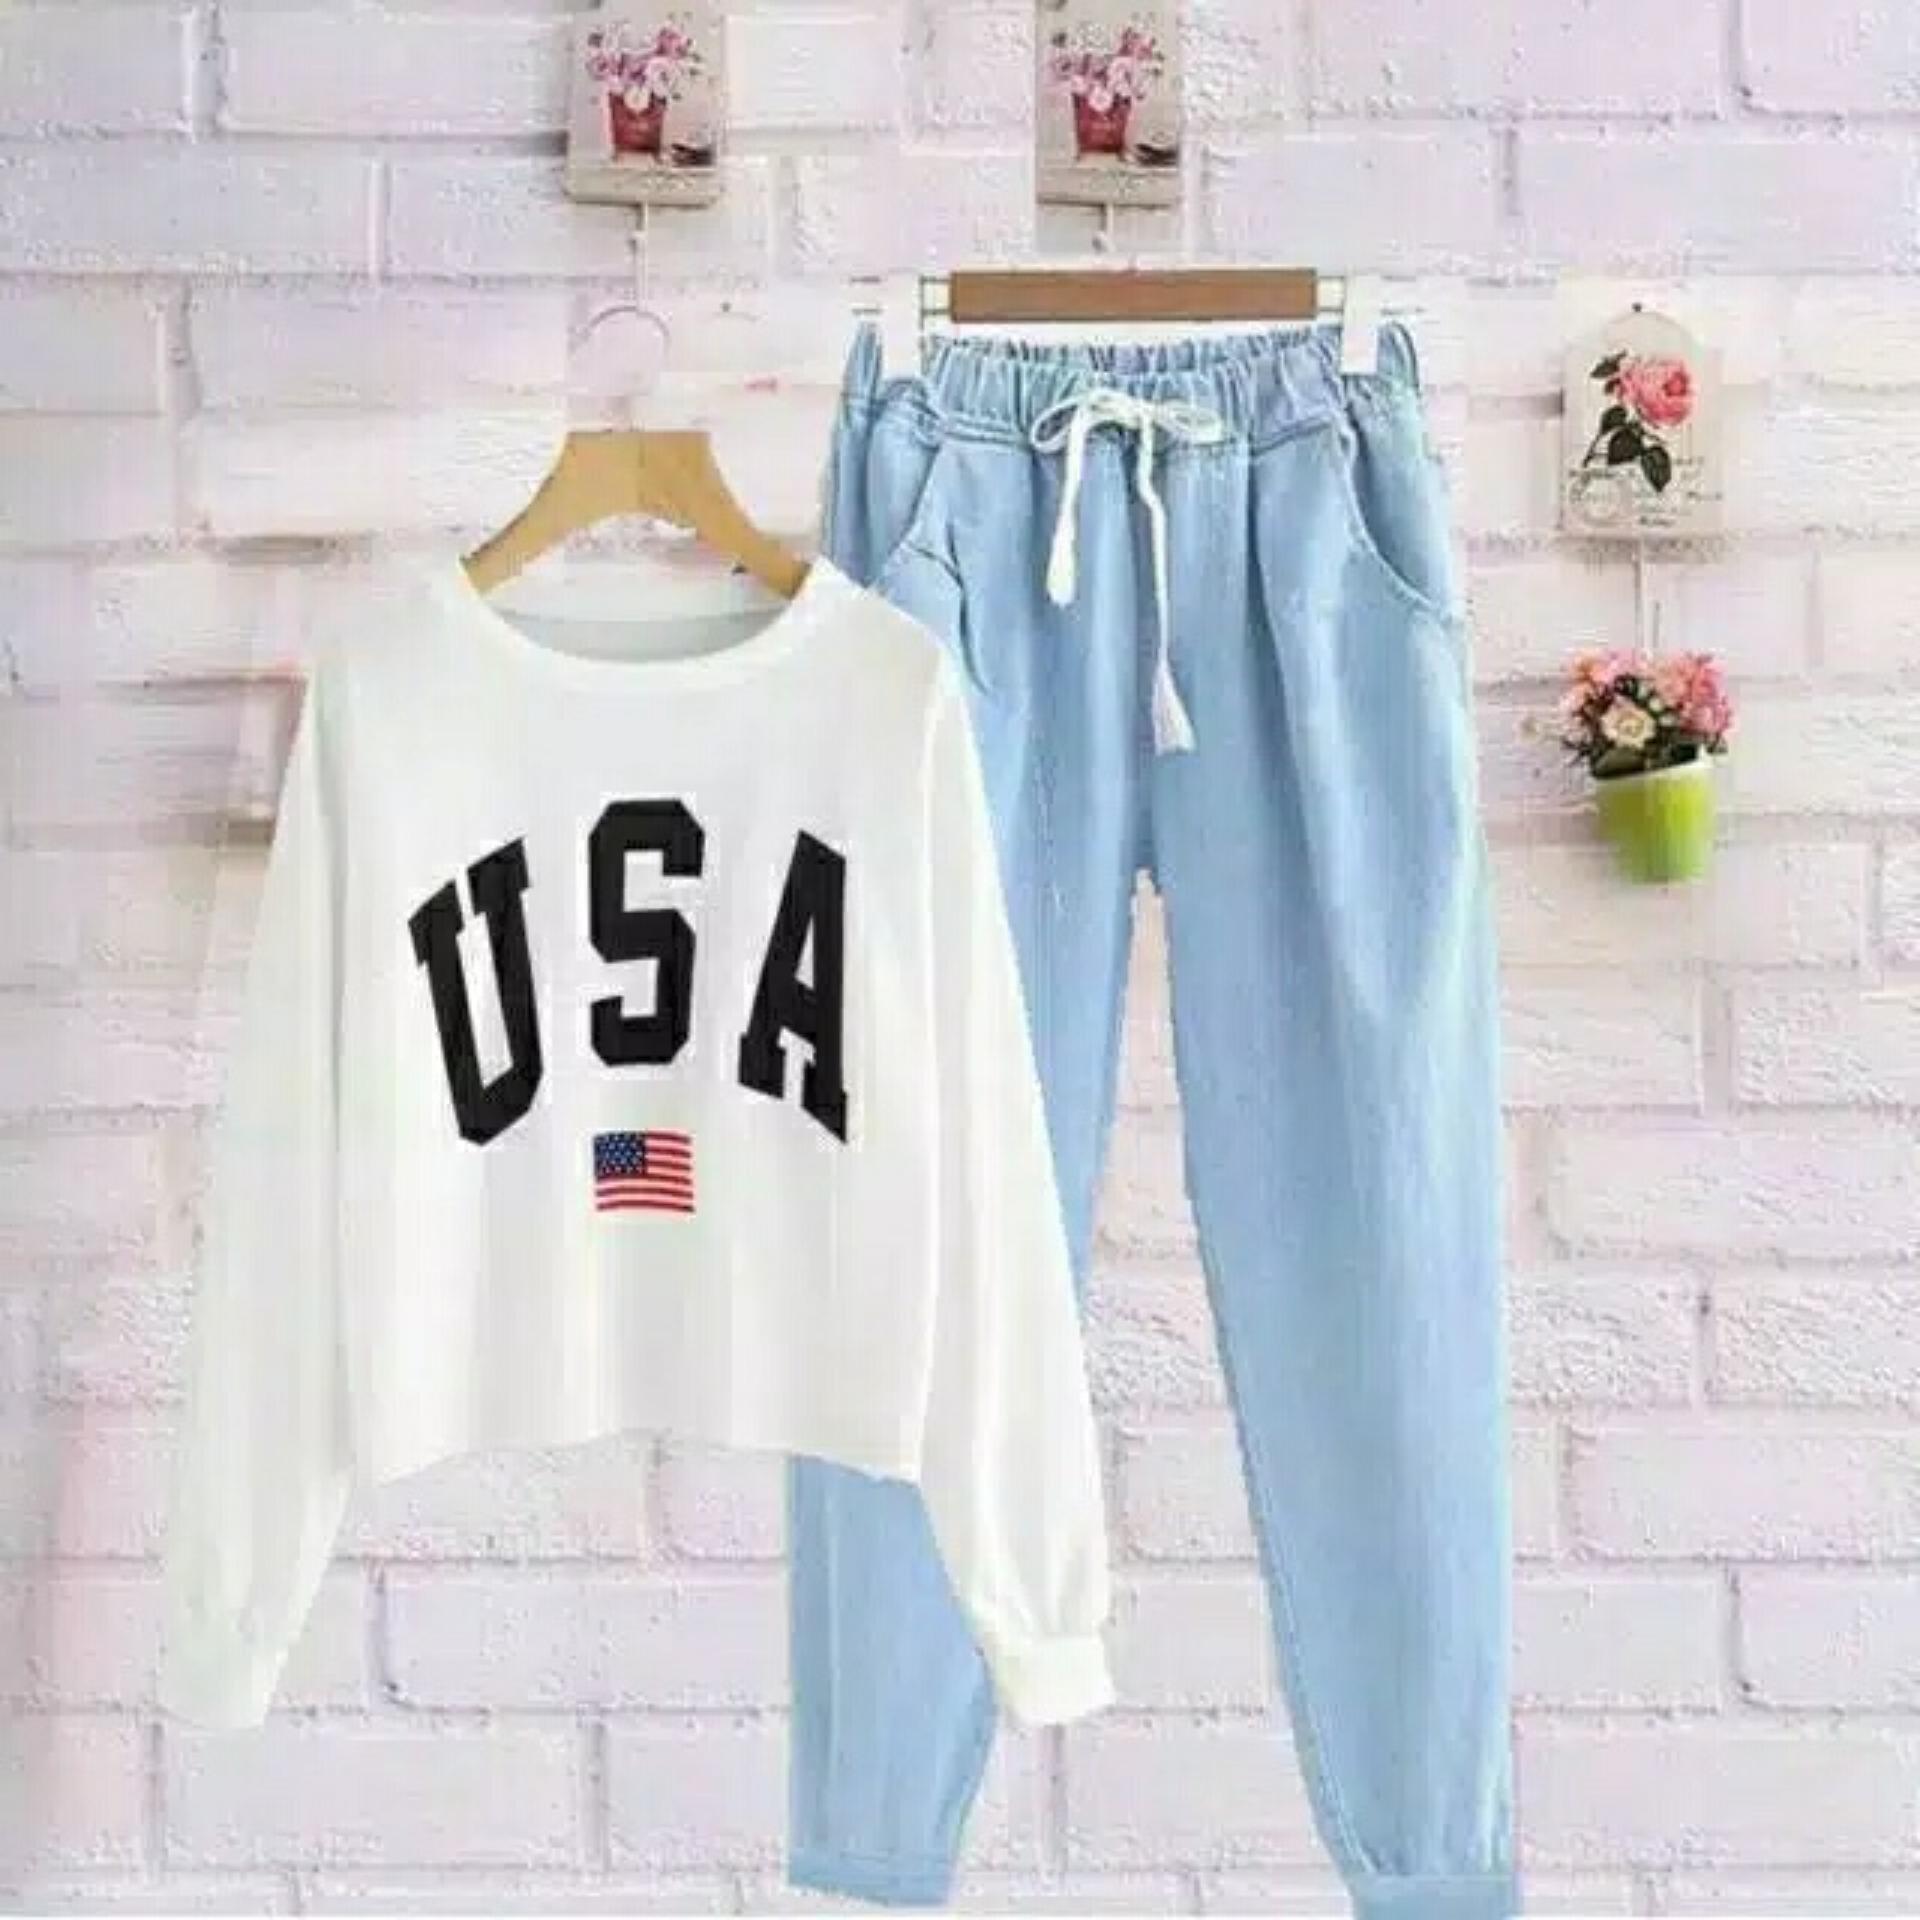 Setelan Baju dan Celana Cewek USA / Setelan Wanita / Stelan Wanita Murah / Baju Wanita